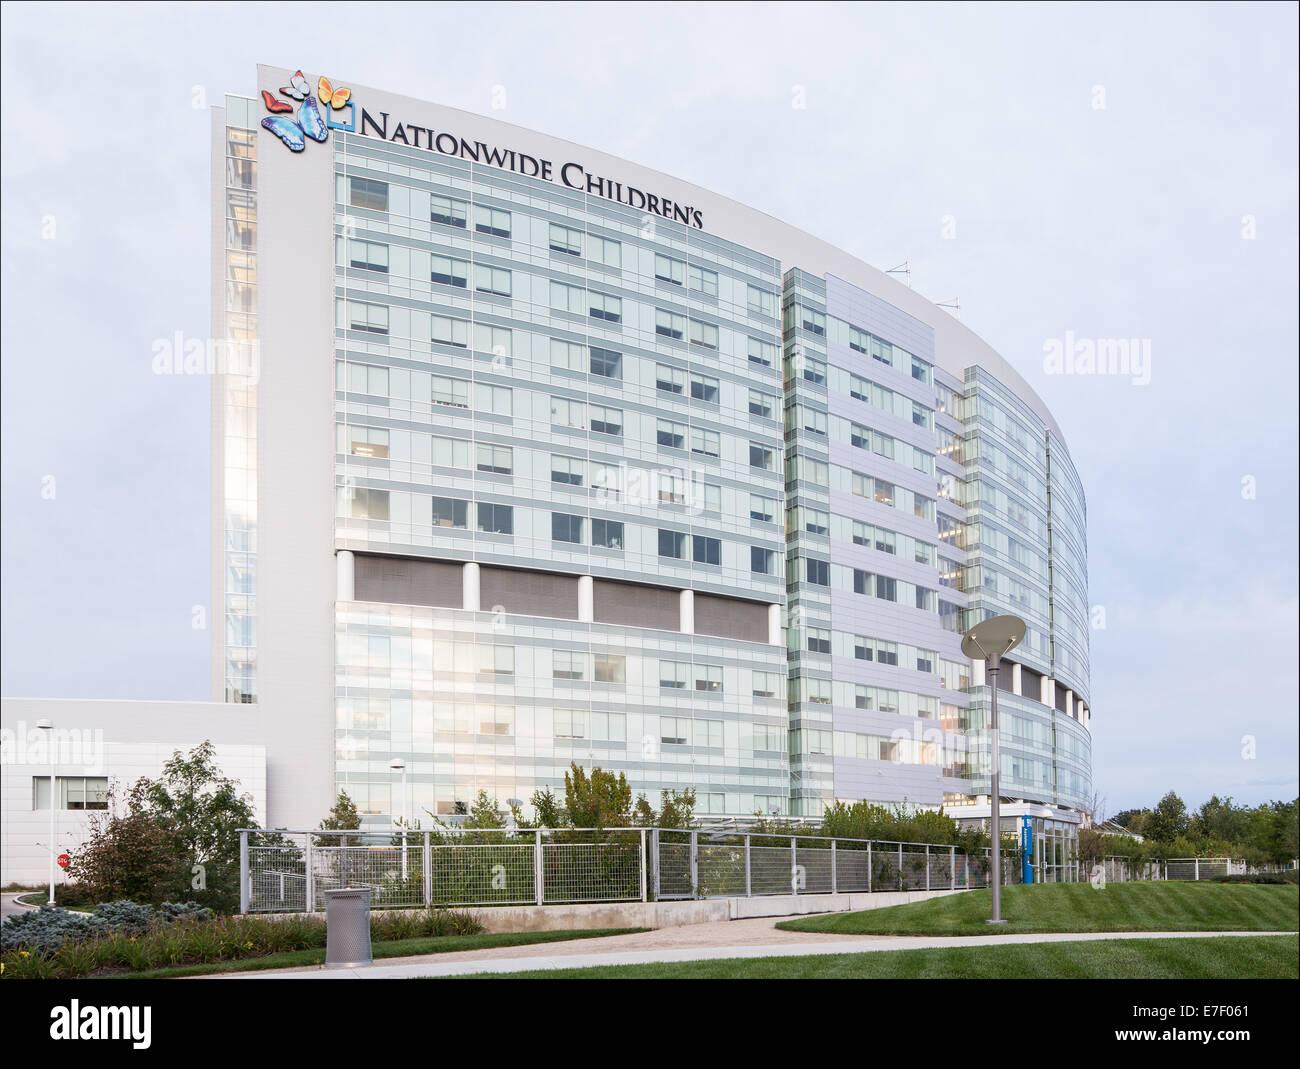 Nationwide Children's Hospital located in Columbus Ohio ...